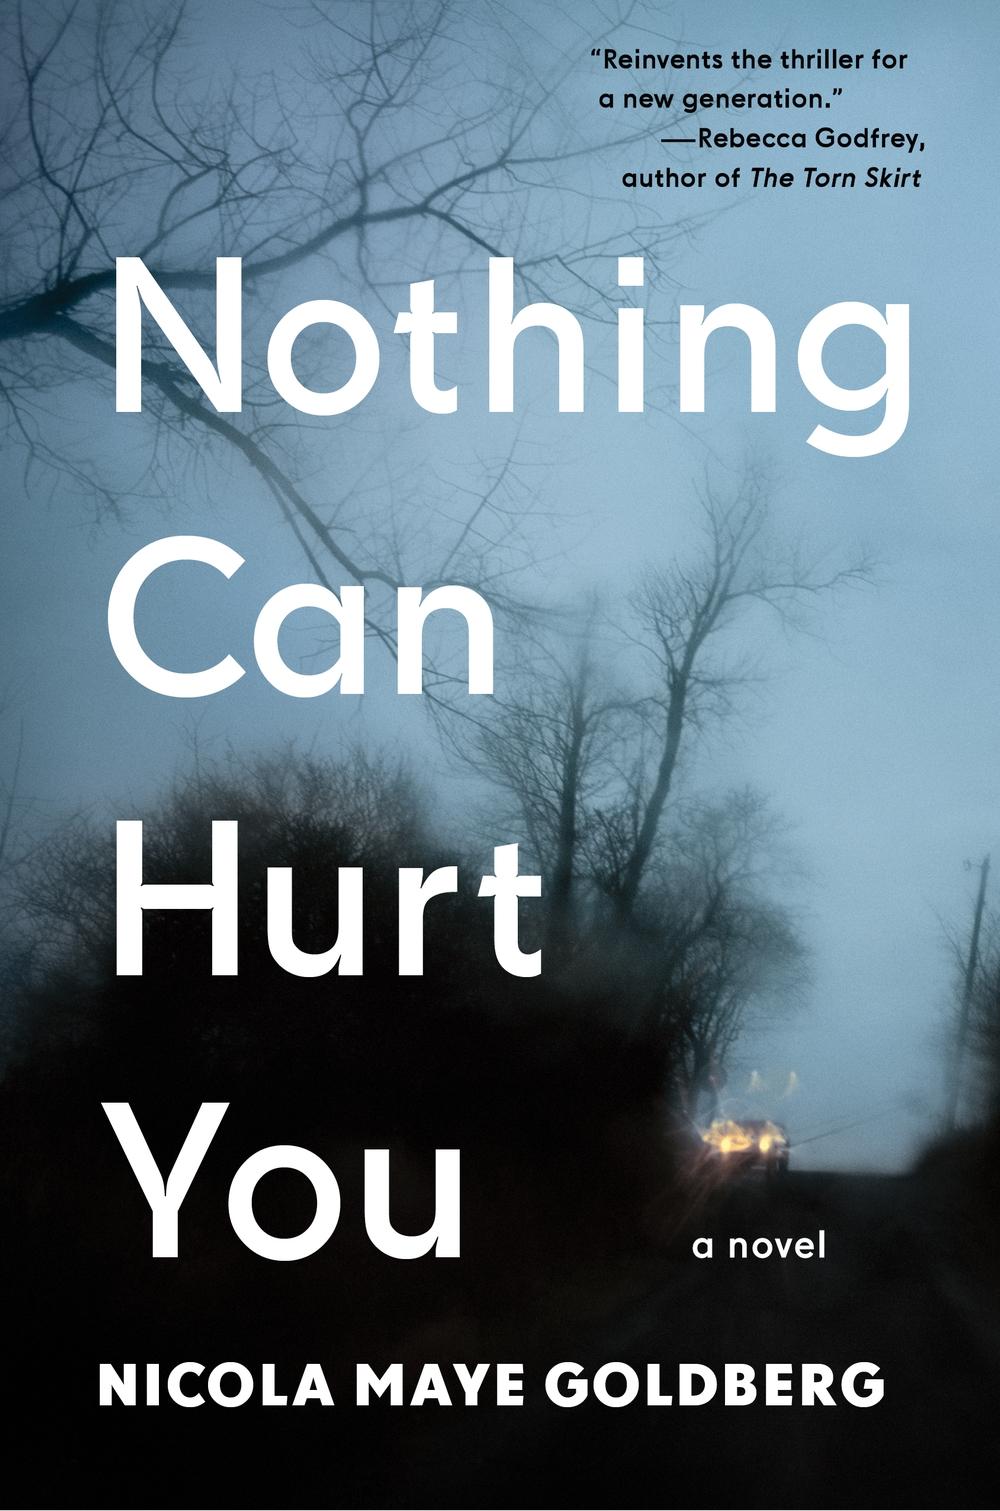 Book Launch: Nothing Can Hurt You by Nicola Maye Goldberg